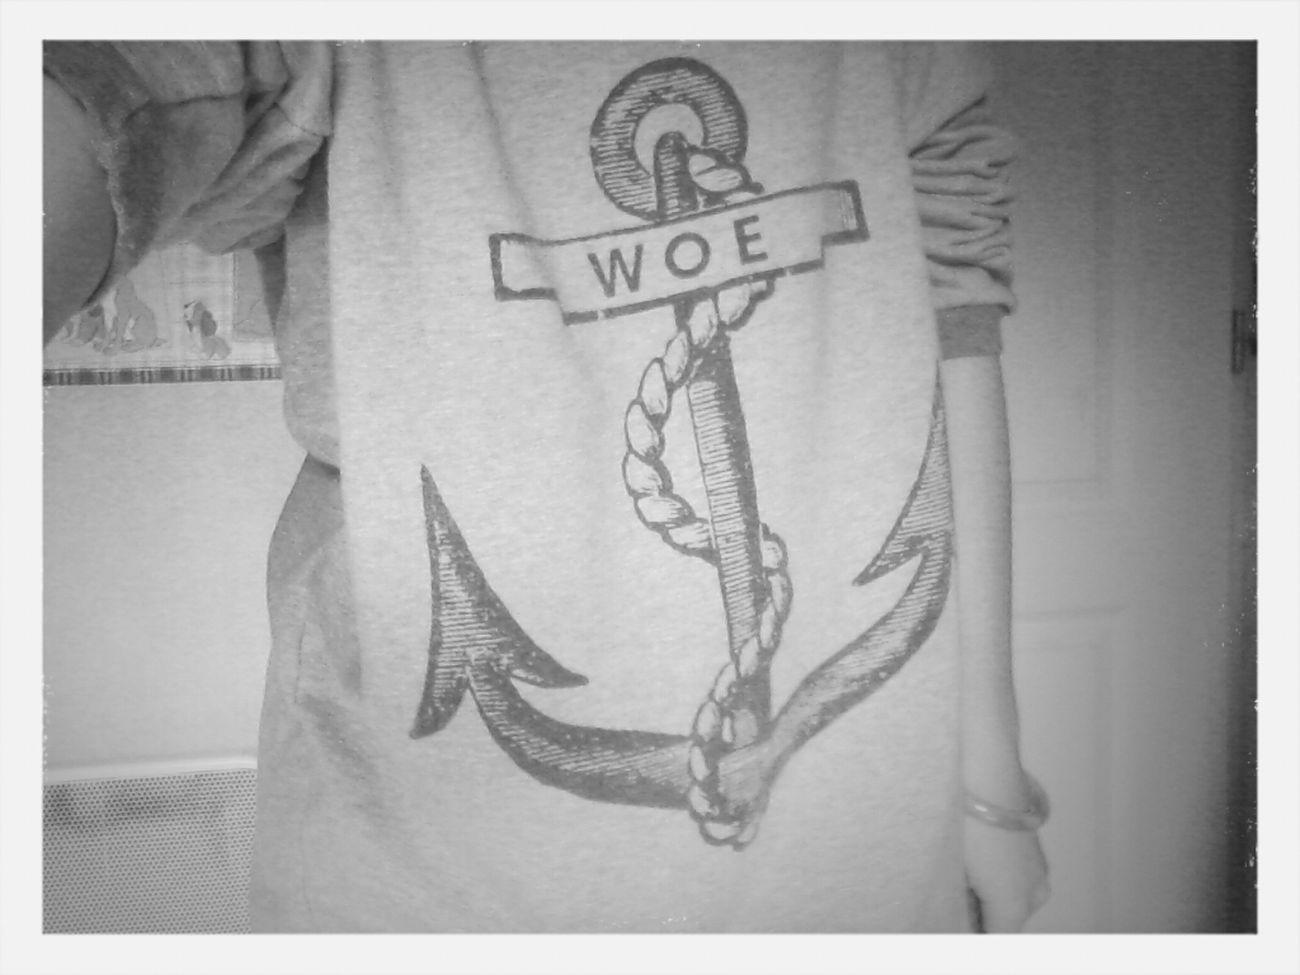 Grey Pull Woe